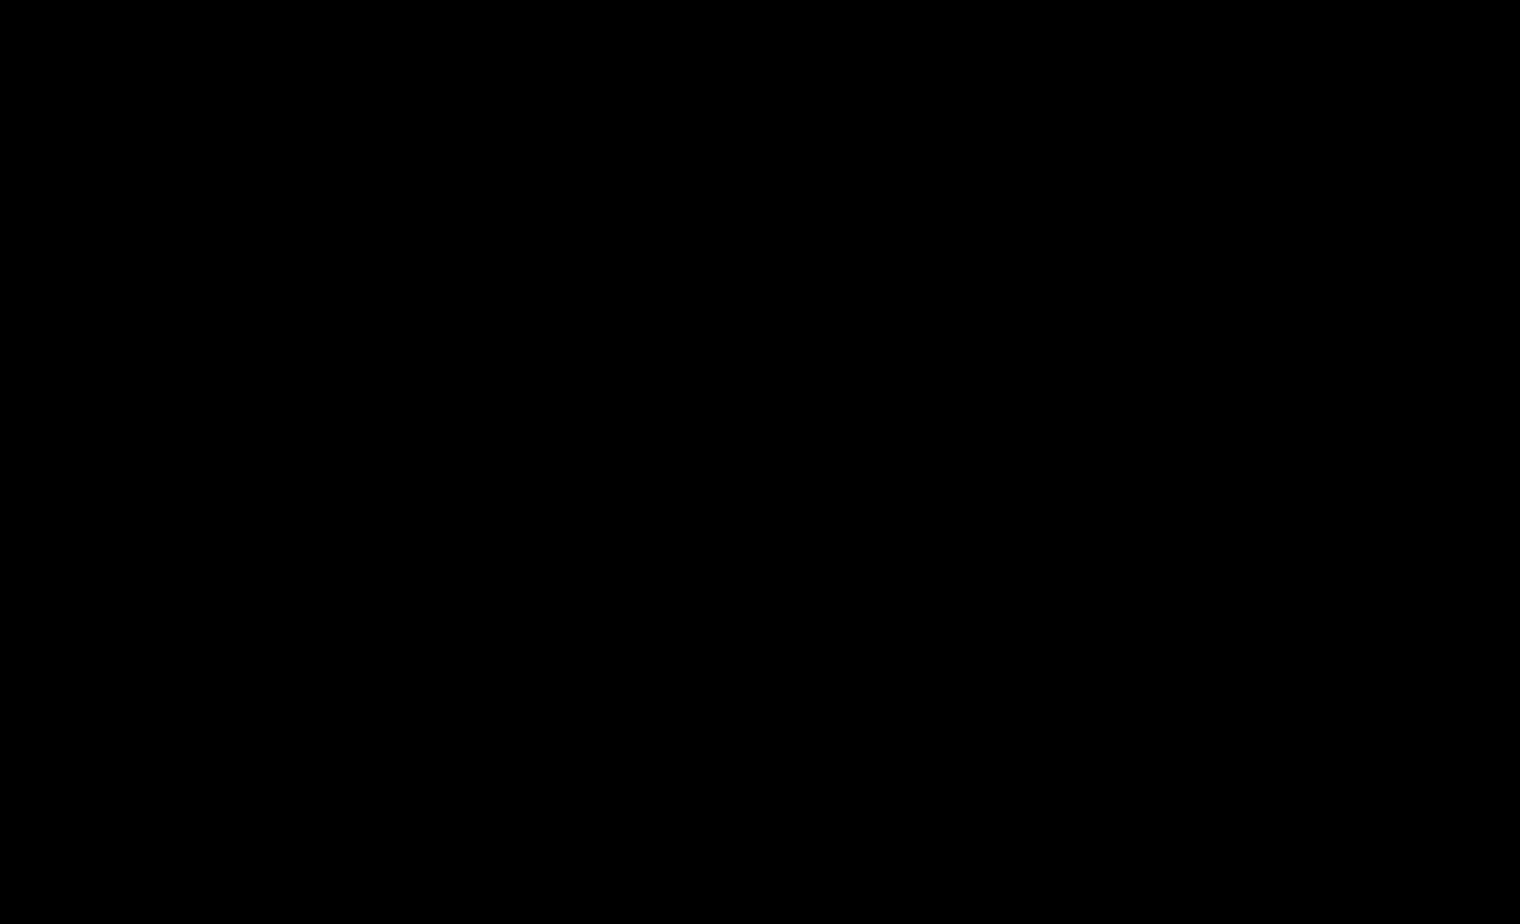 5-Azido-1-N-dansylpentylamine